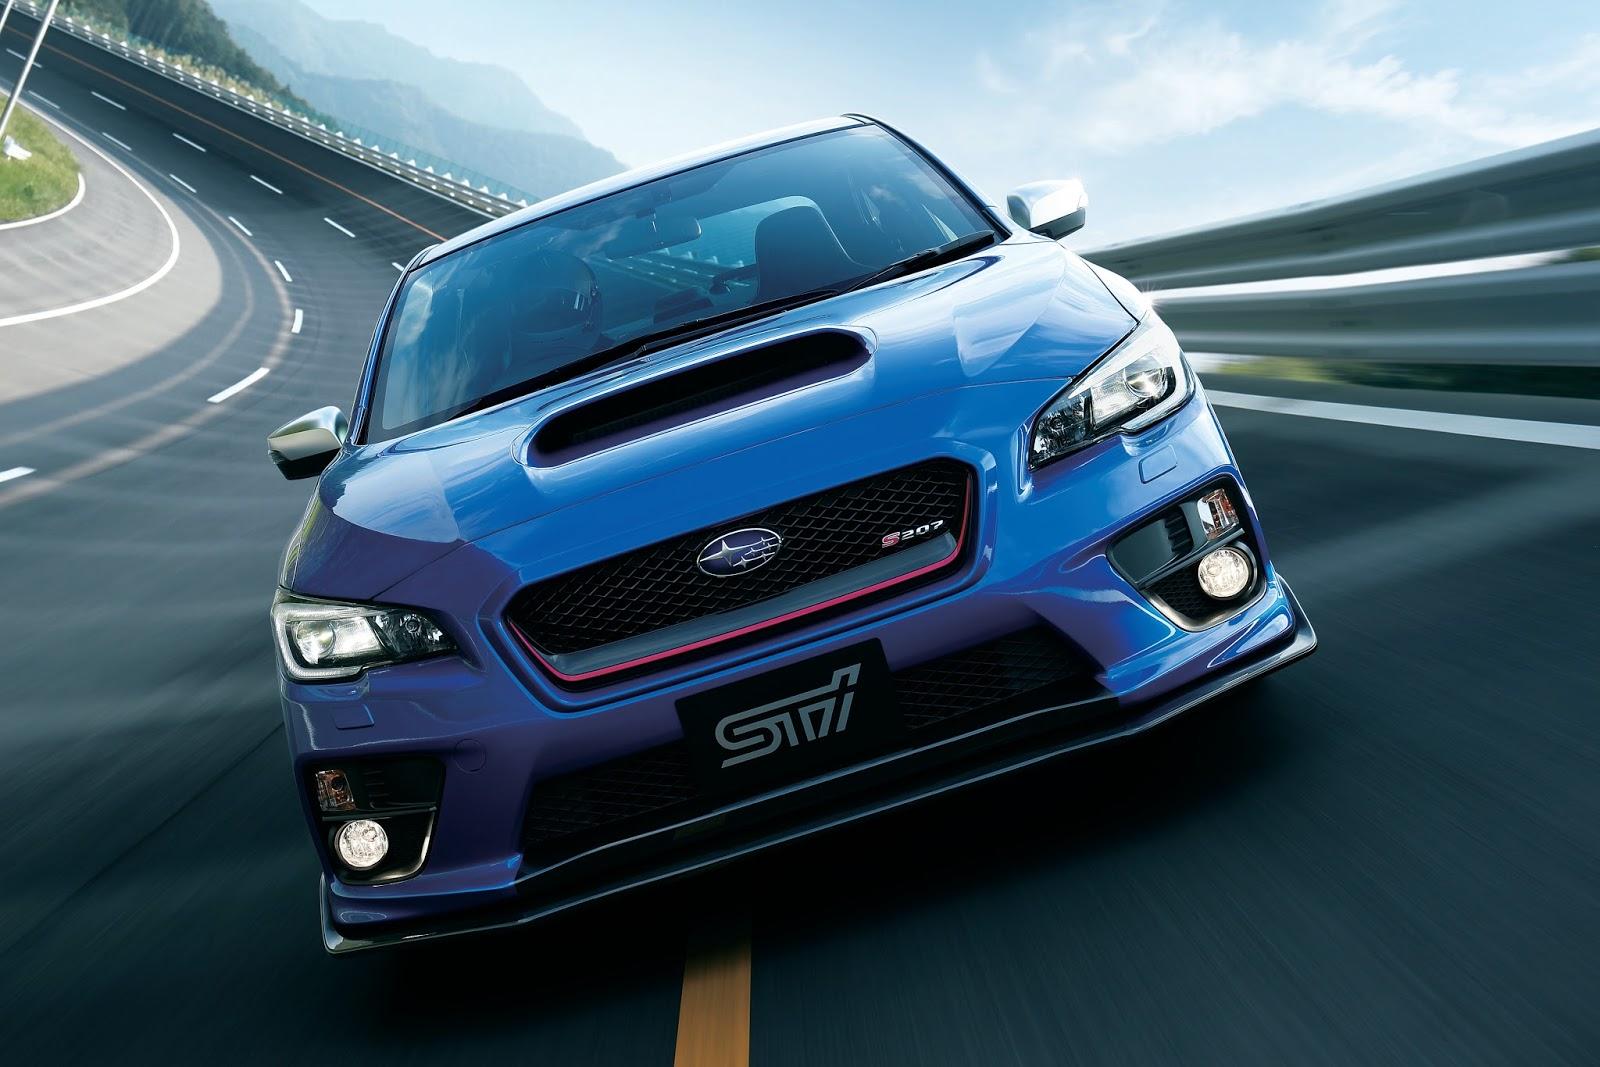 Next Subaru Wrx Sti To Be A Hybrid